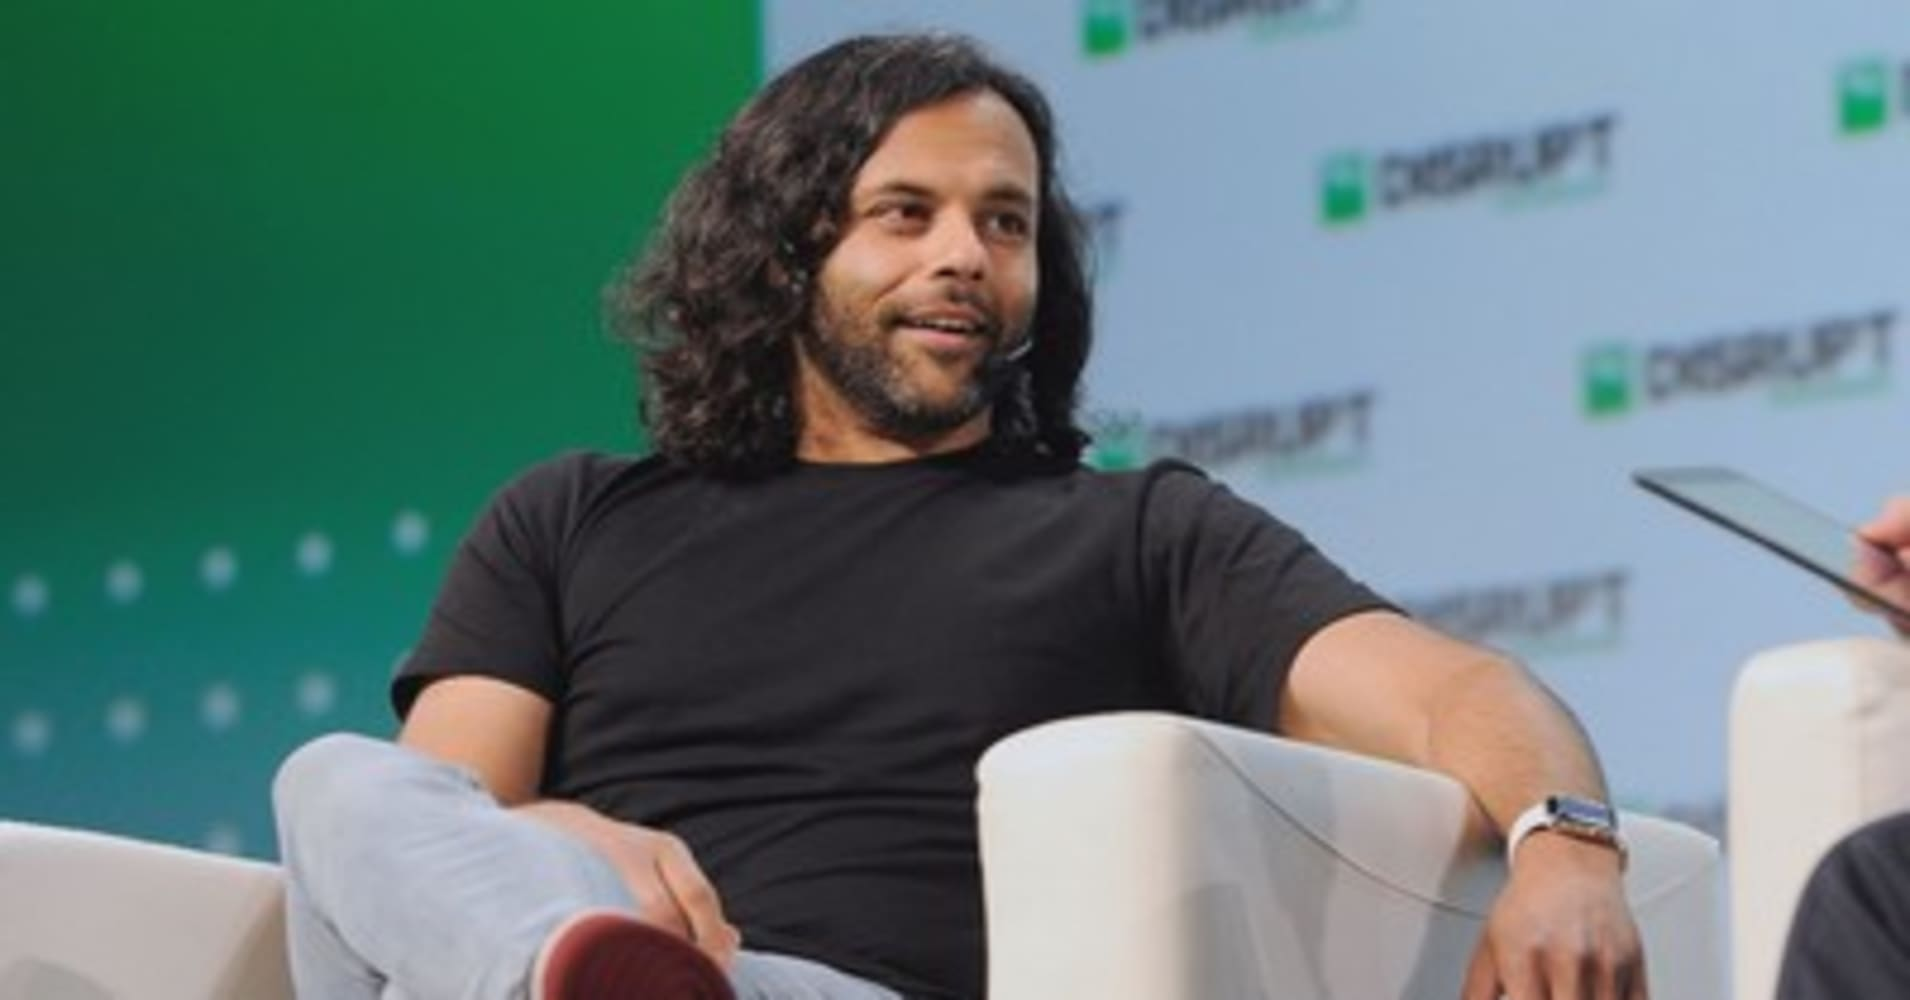 Stock-trading app Robinhood takes aim at banks